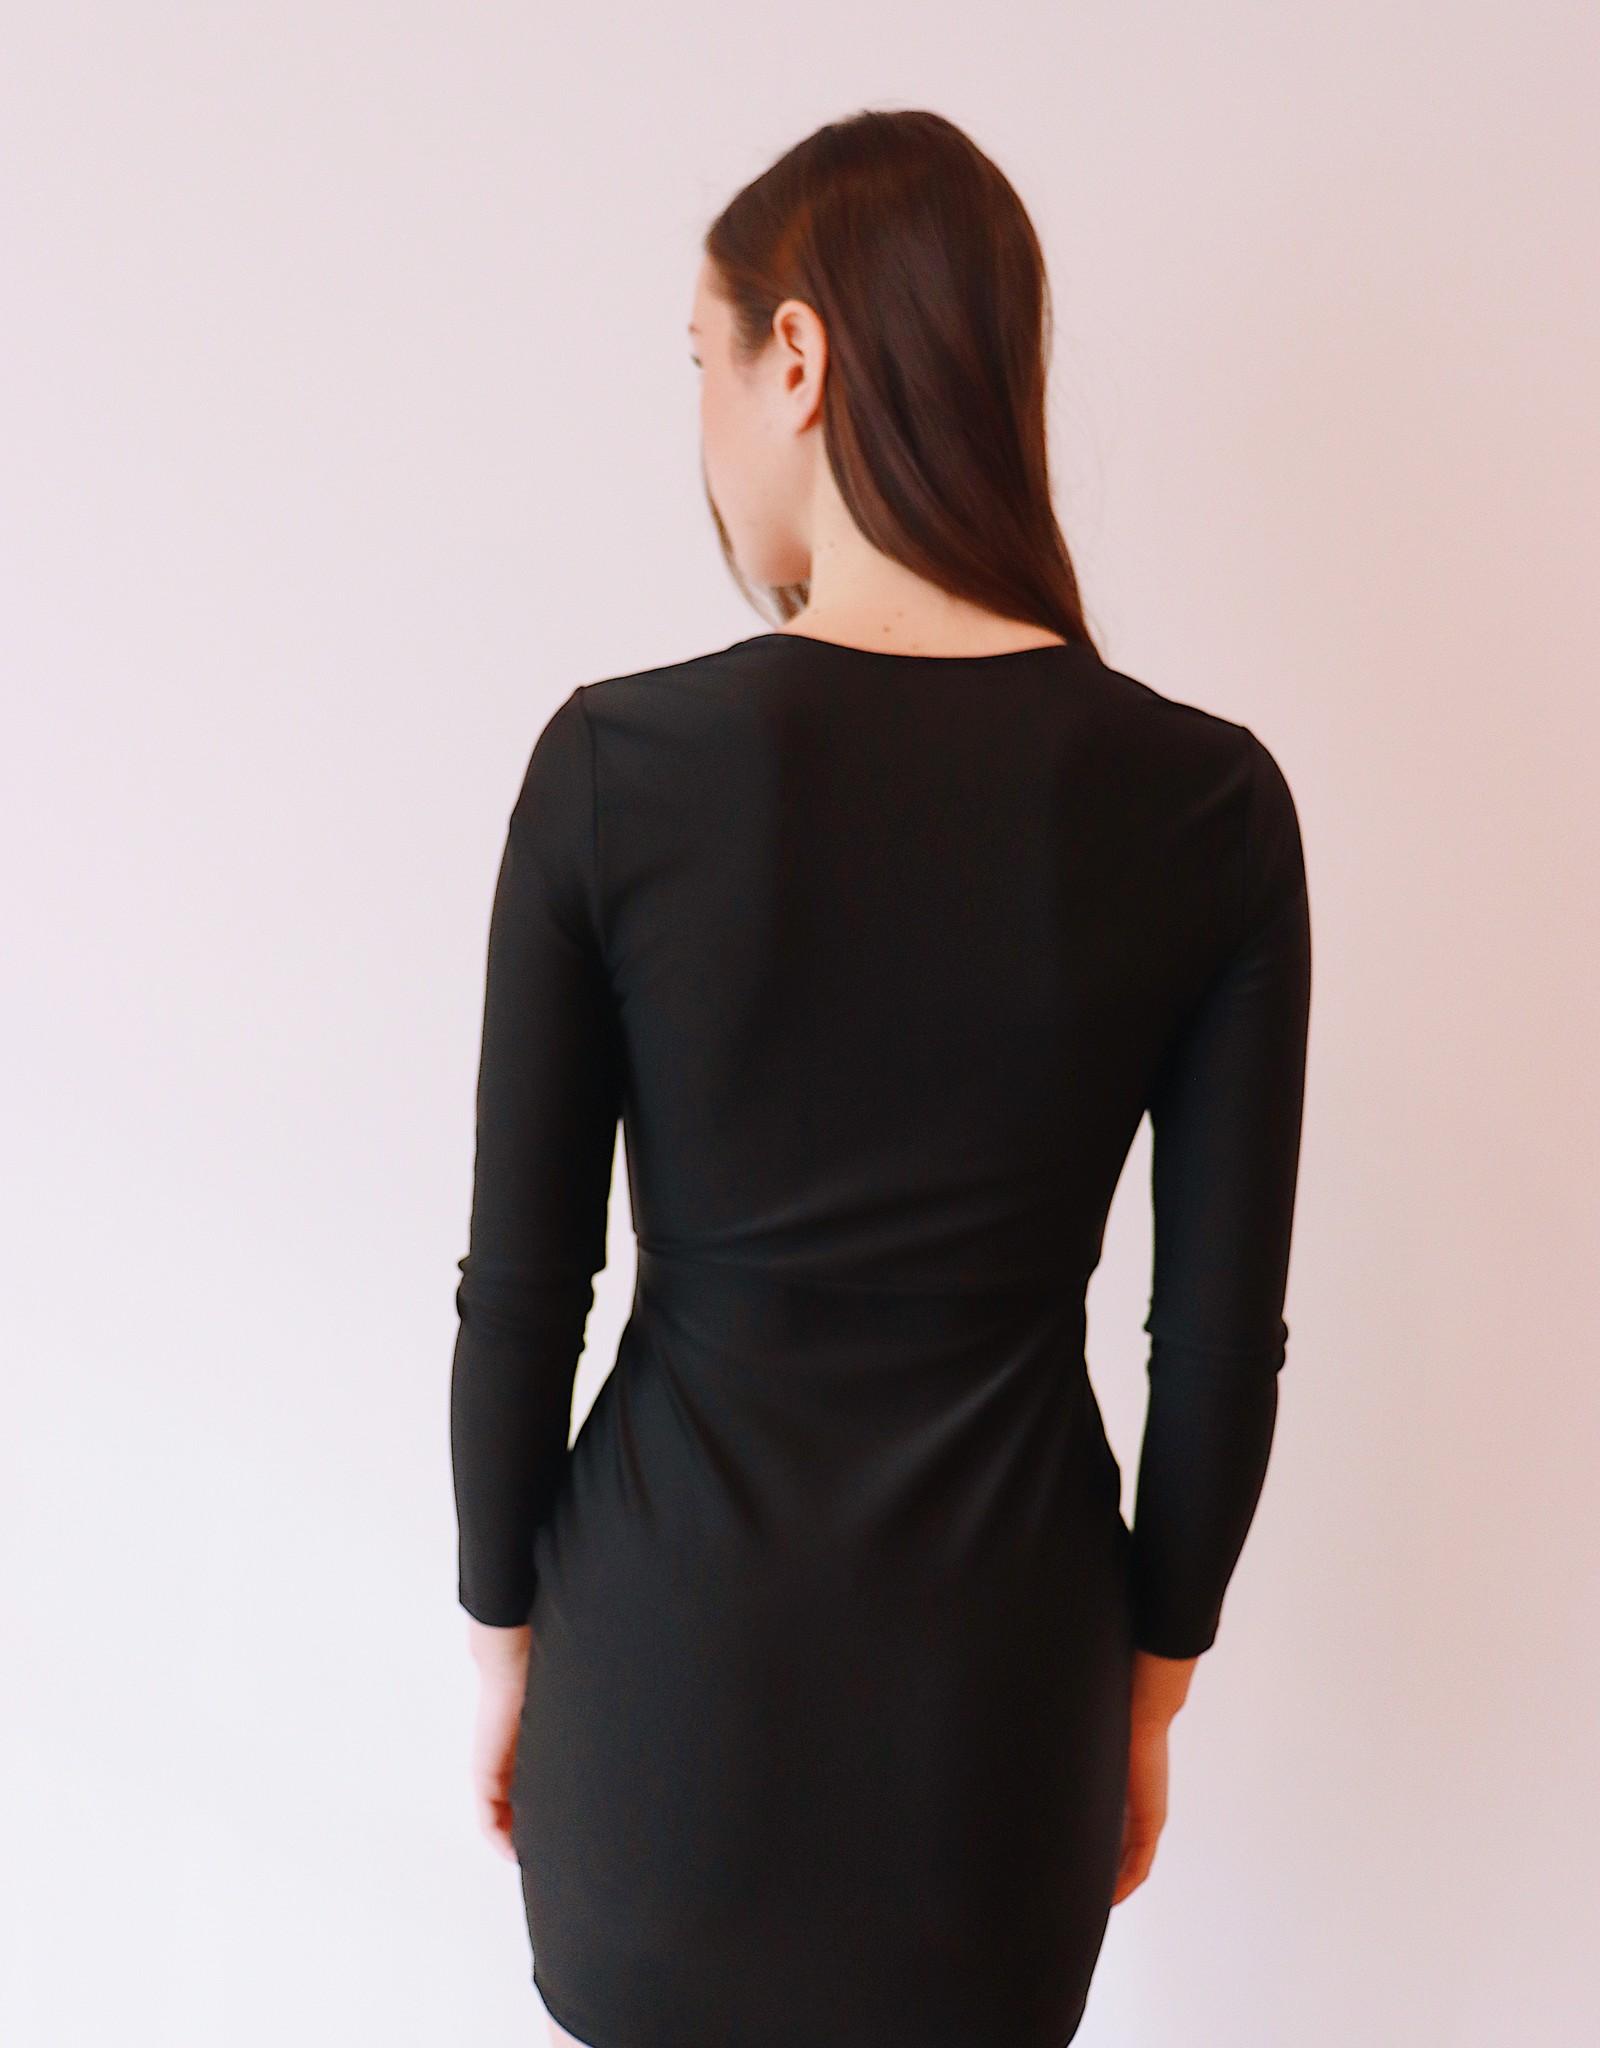 HUSH + SHOUT L/S silky bodycon dress